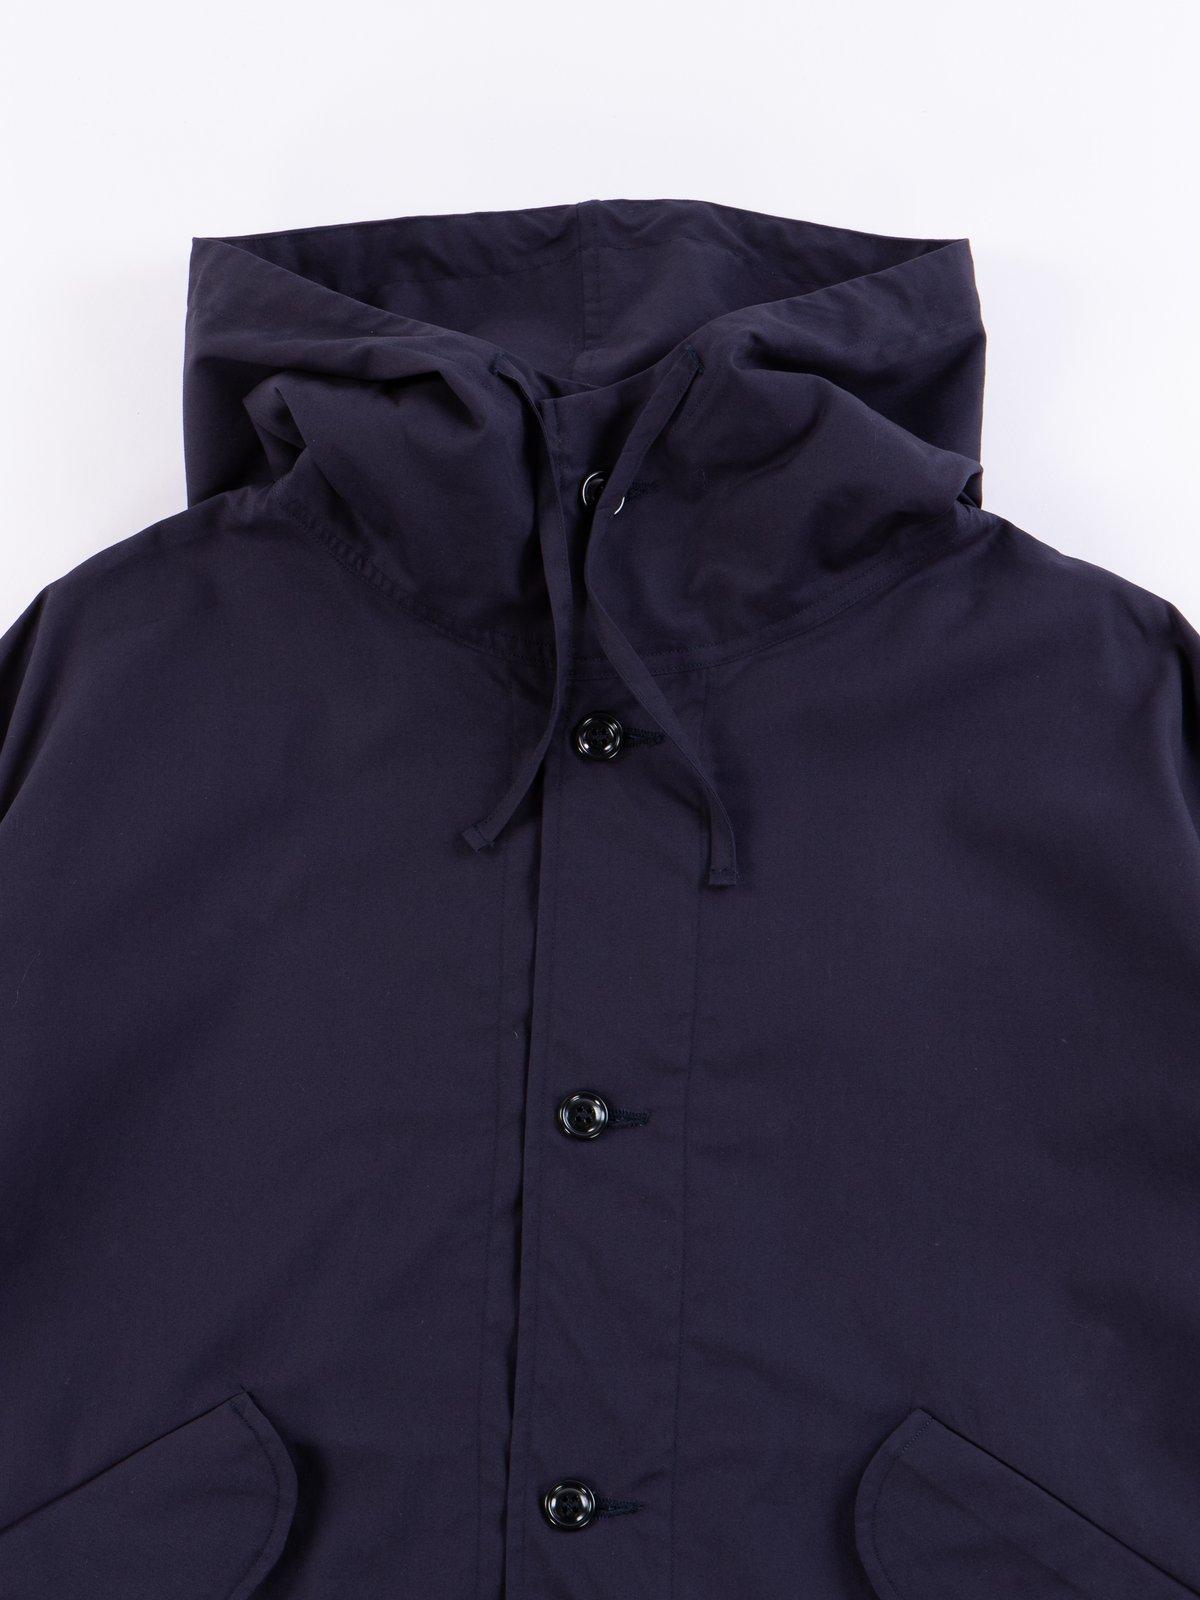 Navy Oxford Vancloth Czech Coat - Image 3